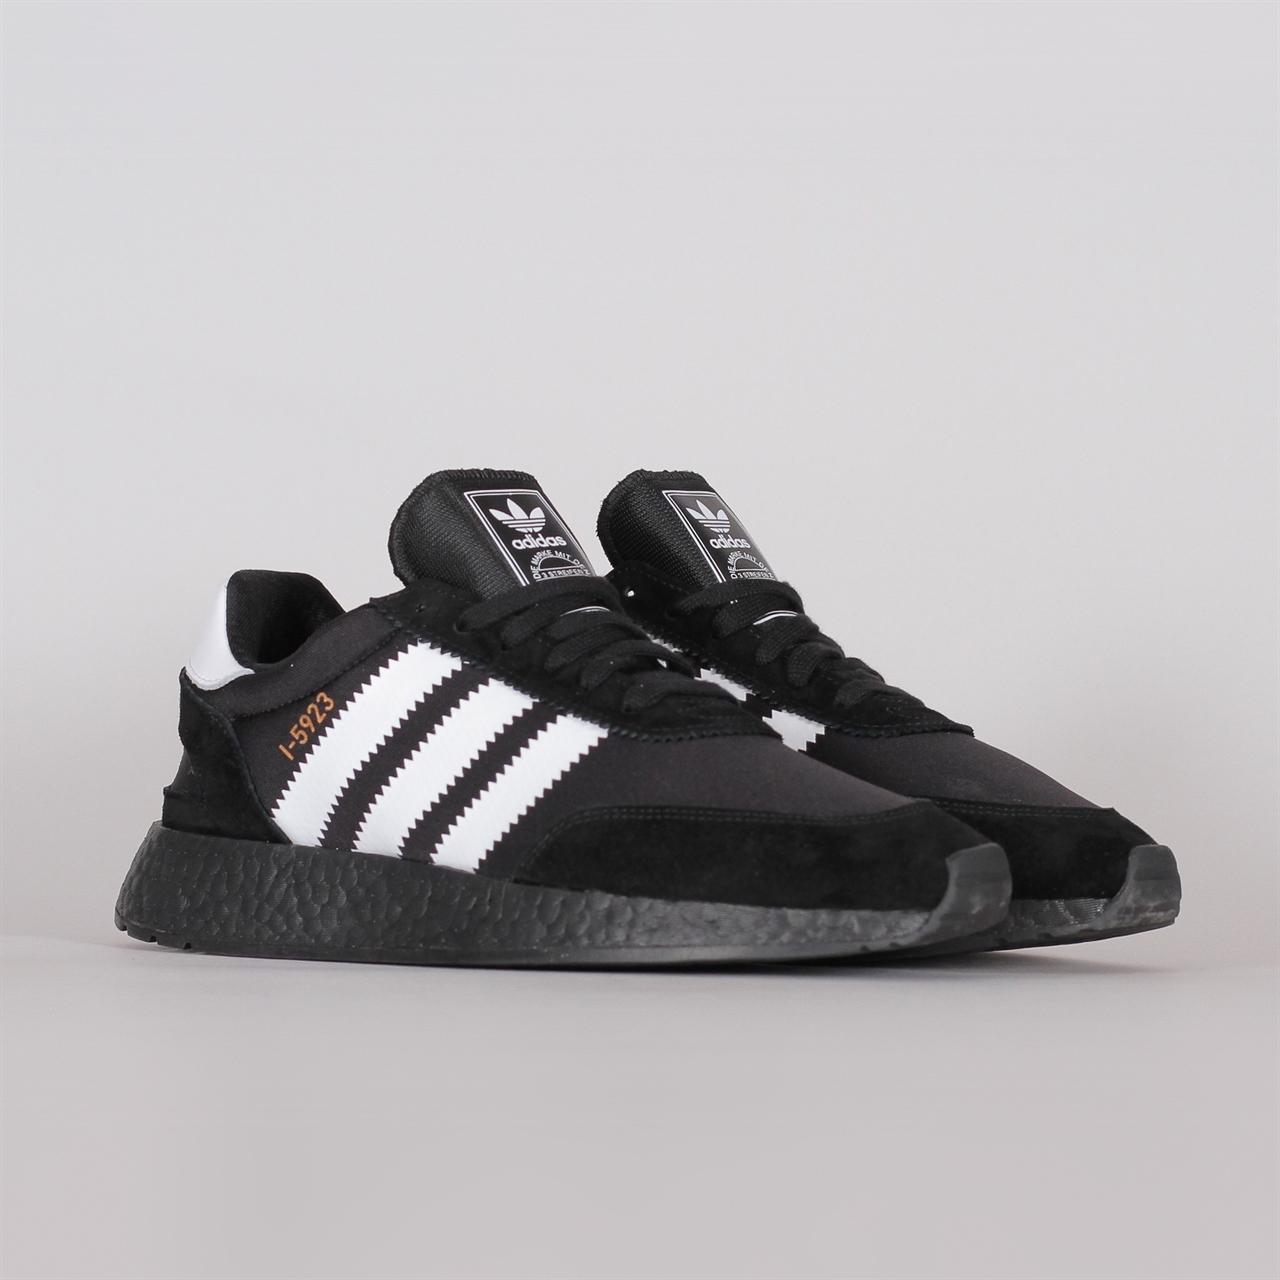 Adidas Iniki Runner r. 46 męskie buty czarne I 5923 boost